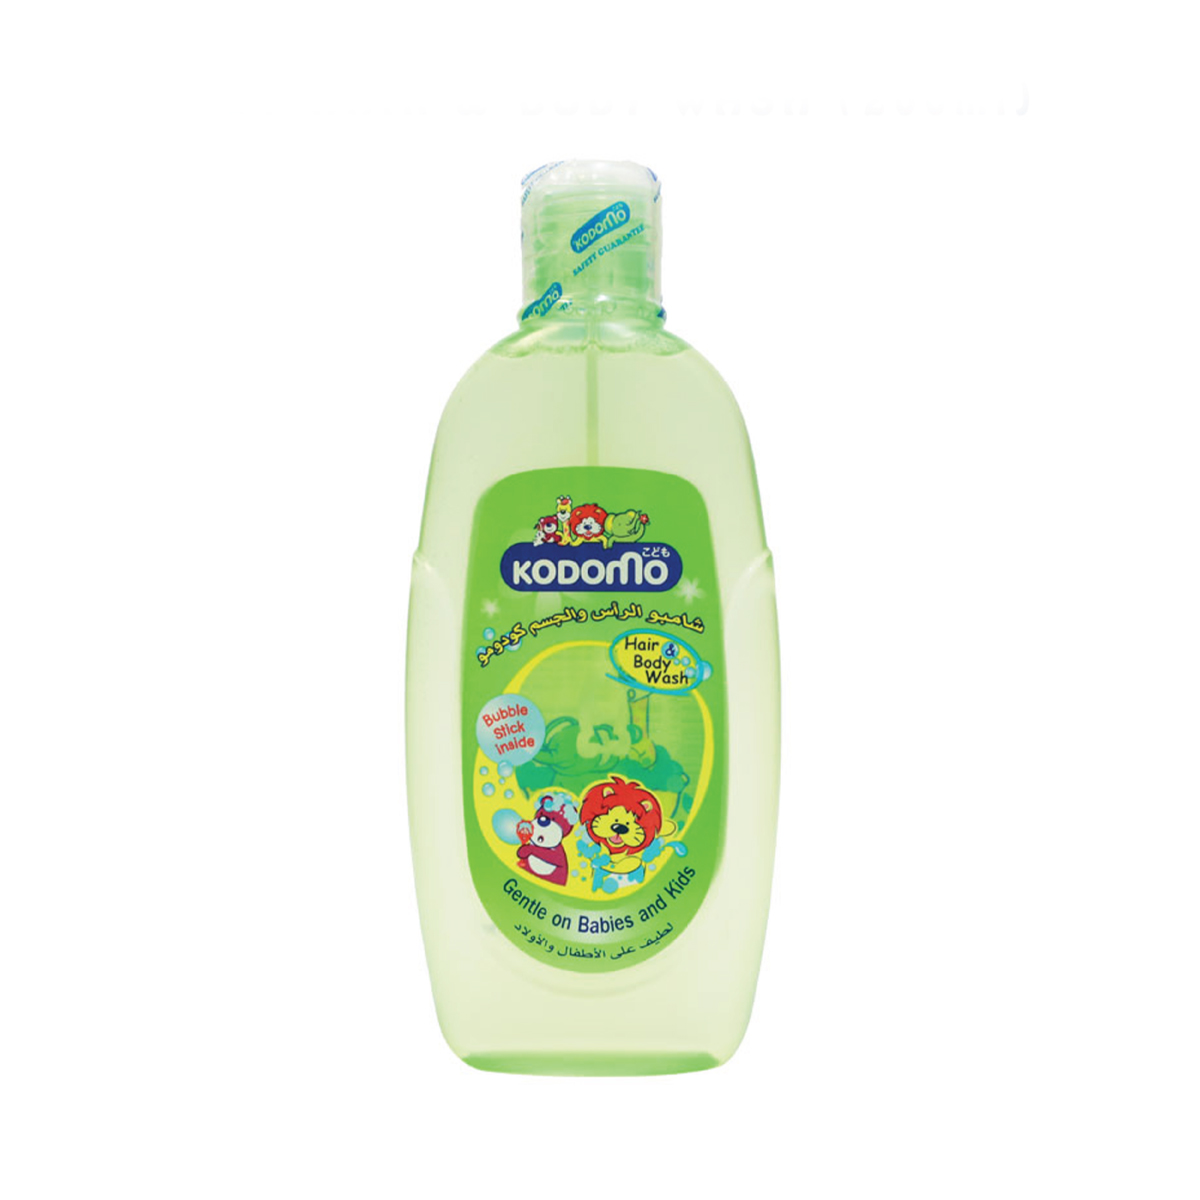 KODOMO Baby Hair & Body Wash- 200 ml